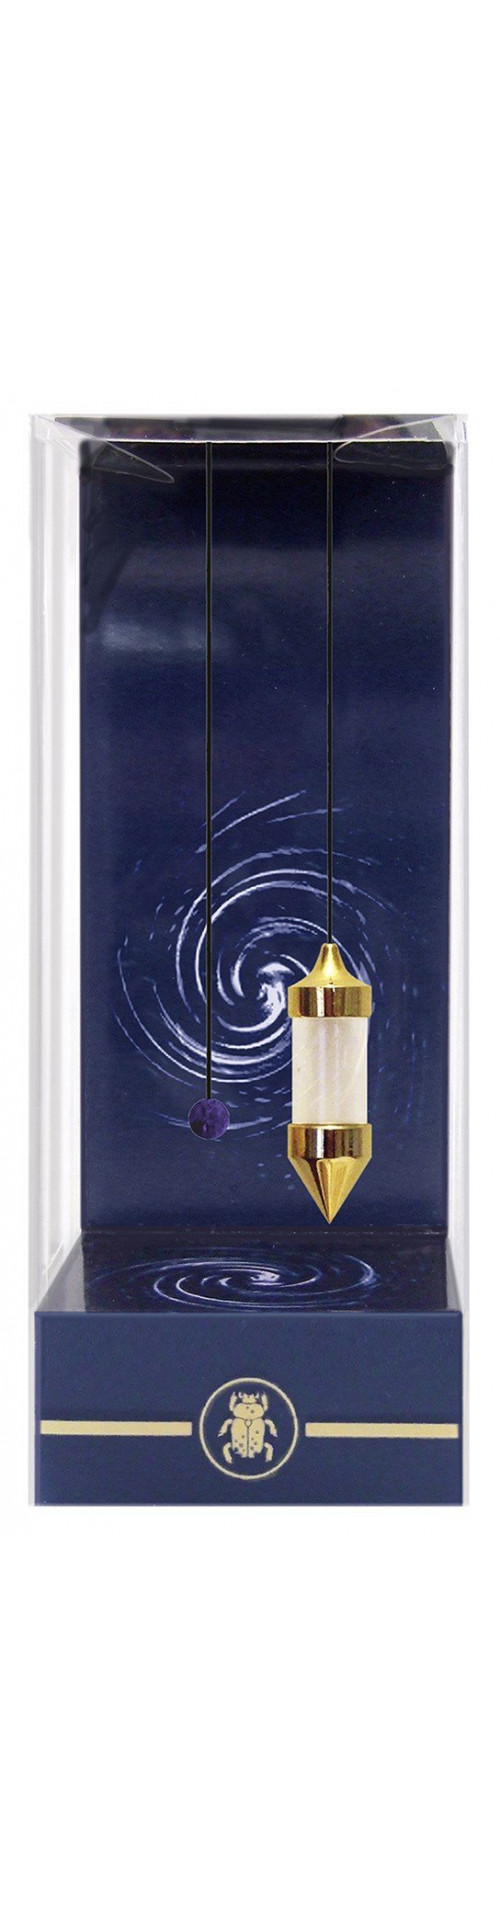 Classic Transparent Chamber Pendulum